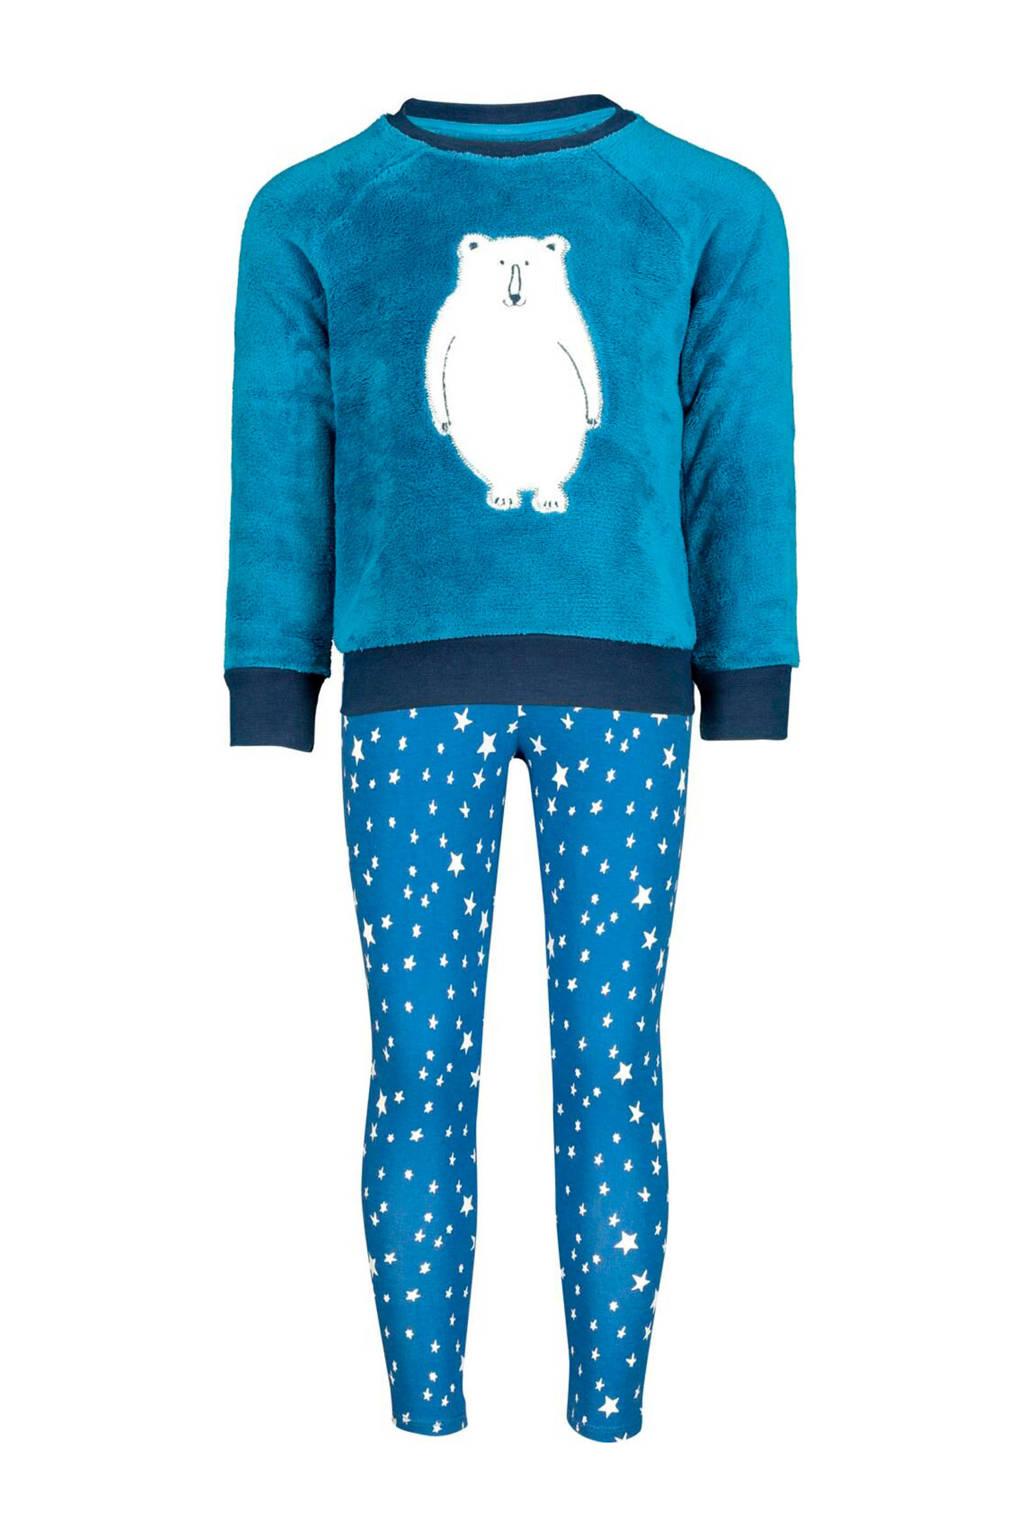 HEMA   pyjama met print blauw/wit, Blauw/wit/donkerblauw